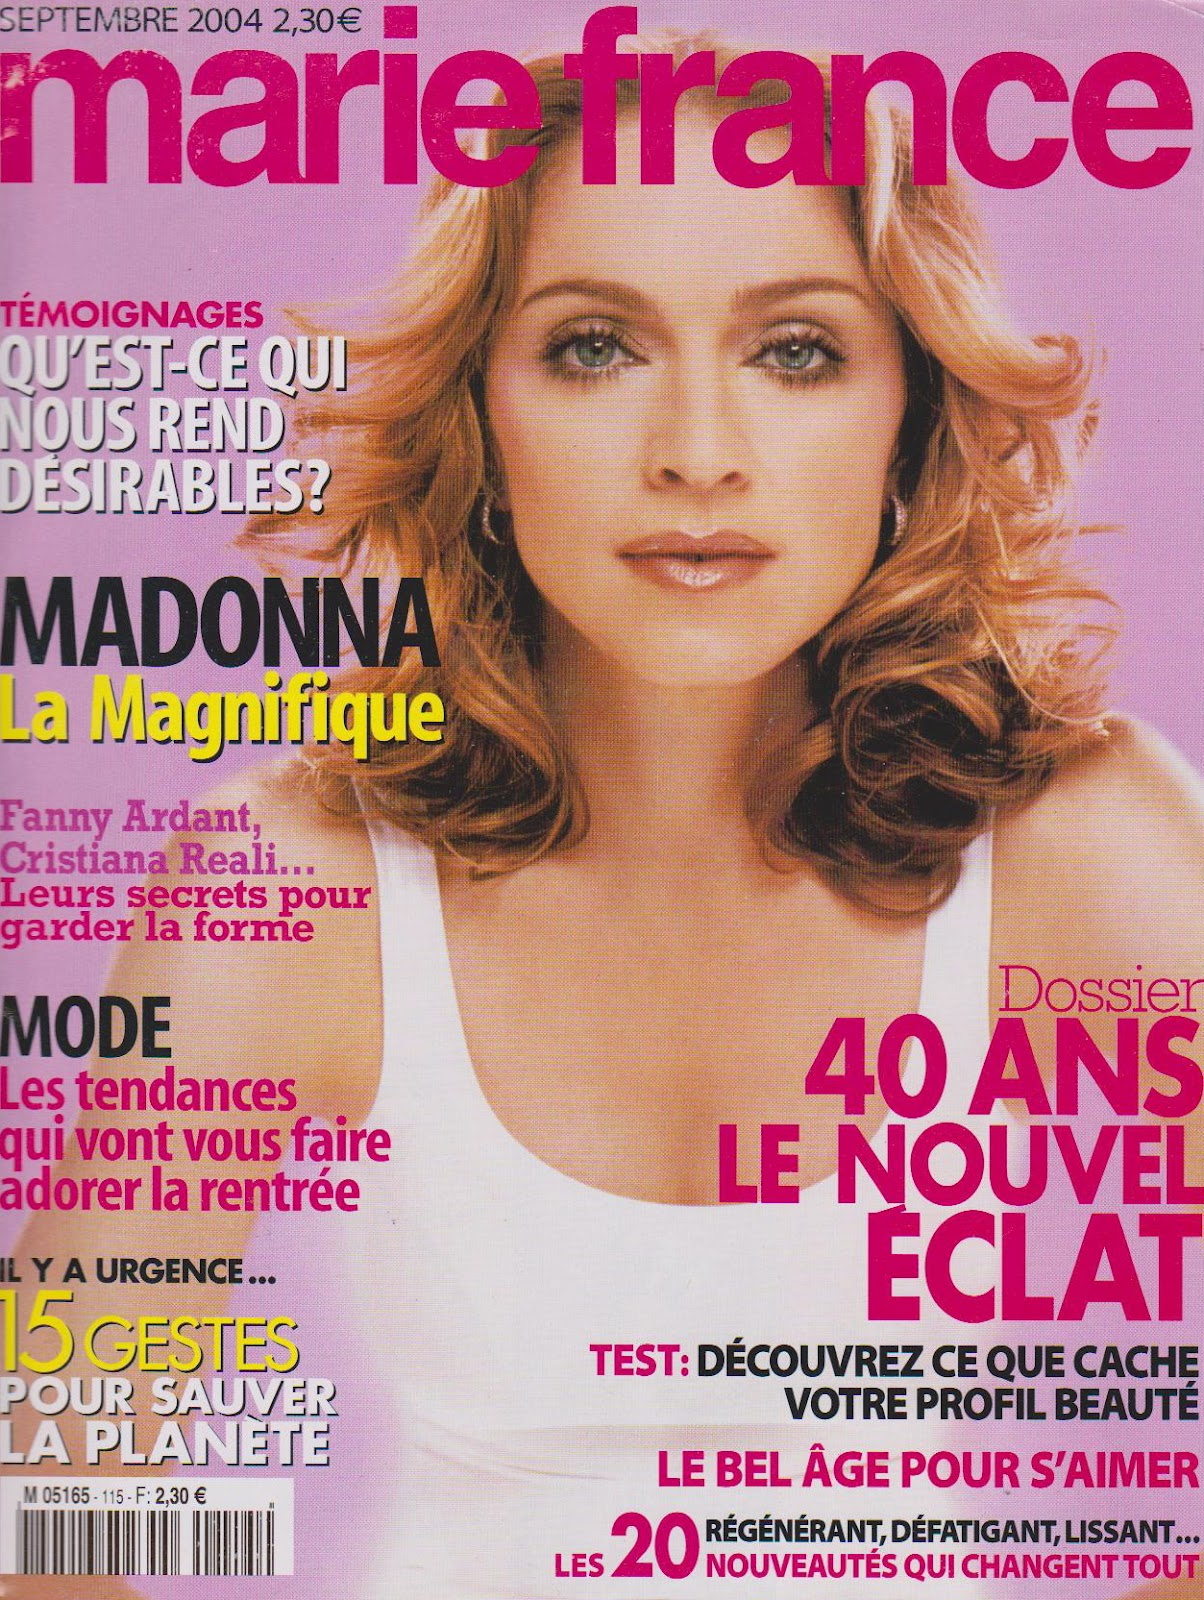 madmusic1 my madonna collection magazine marie france france september 2004. Black Bedroom Furniture Sets. Home Design Ideas